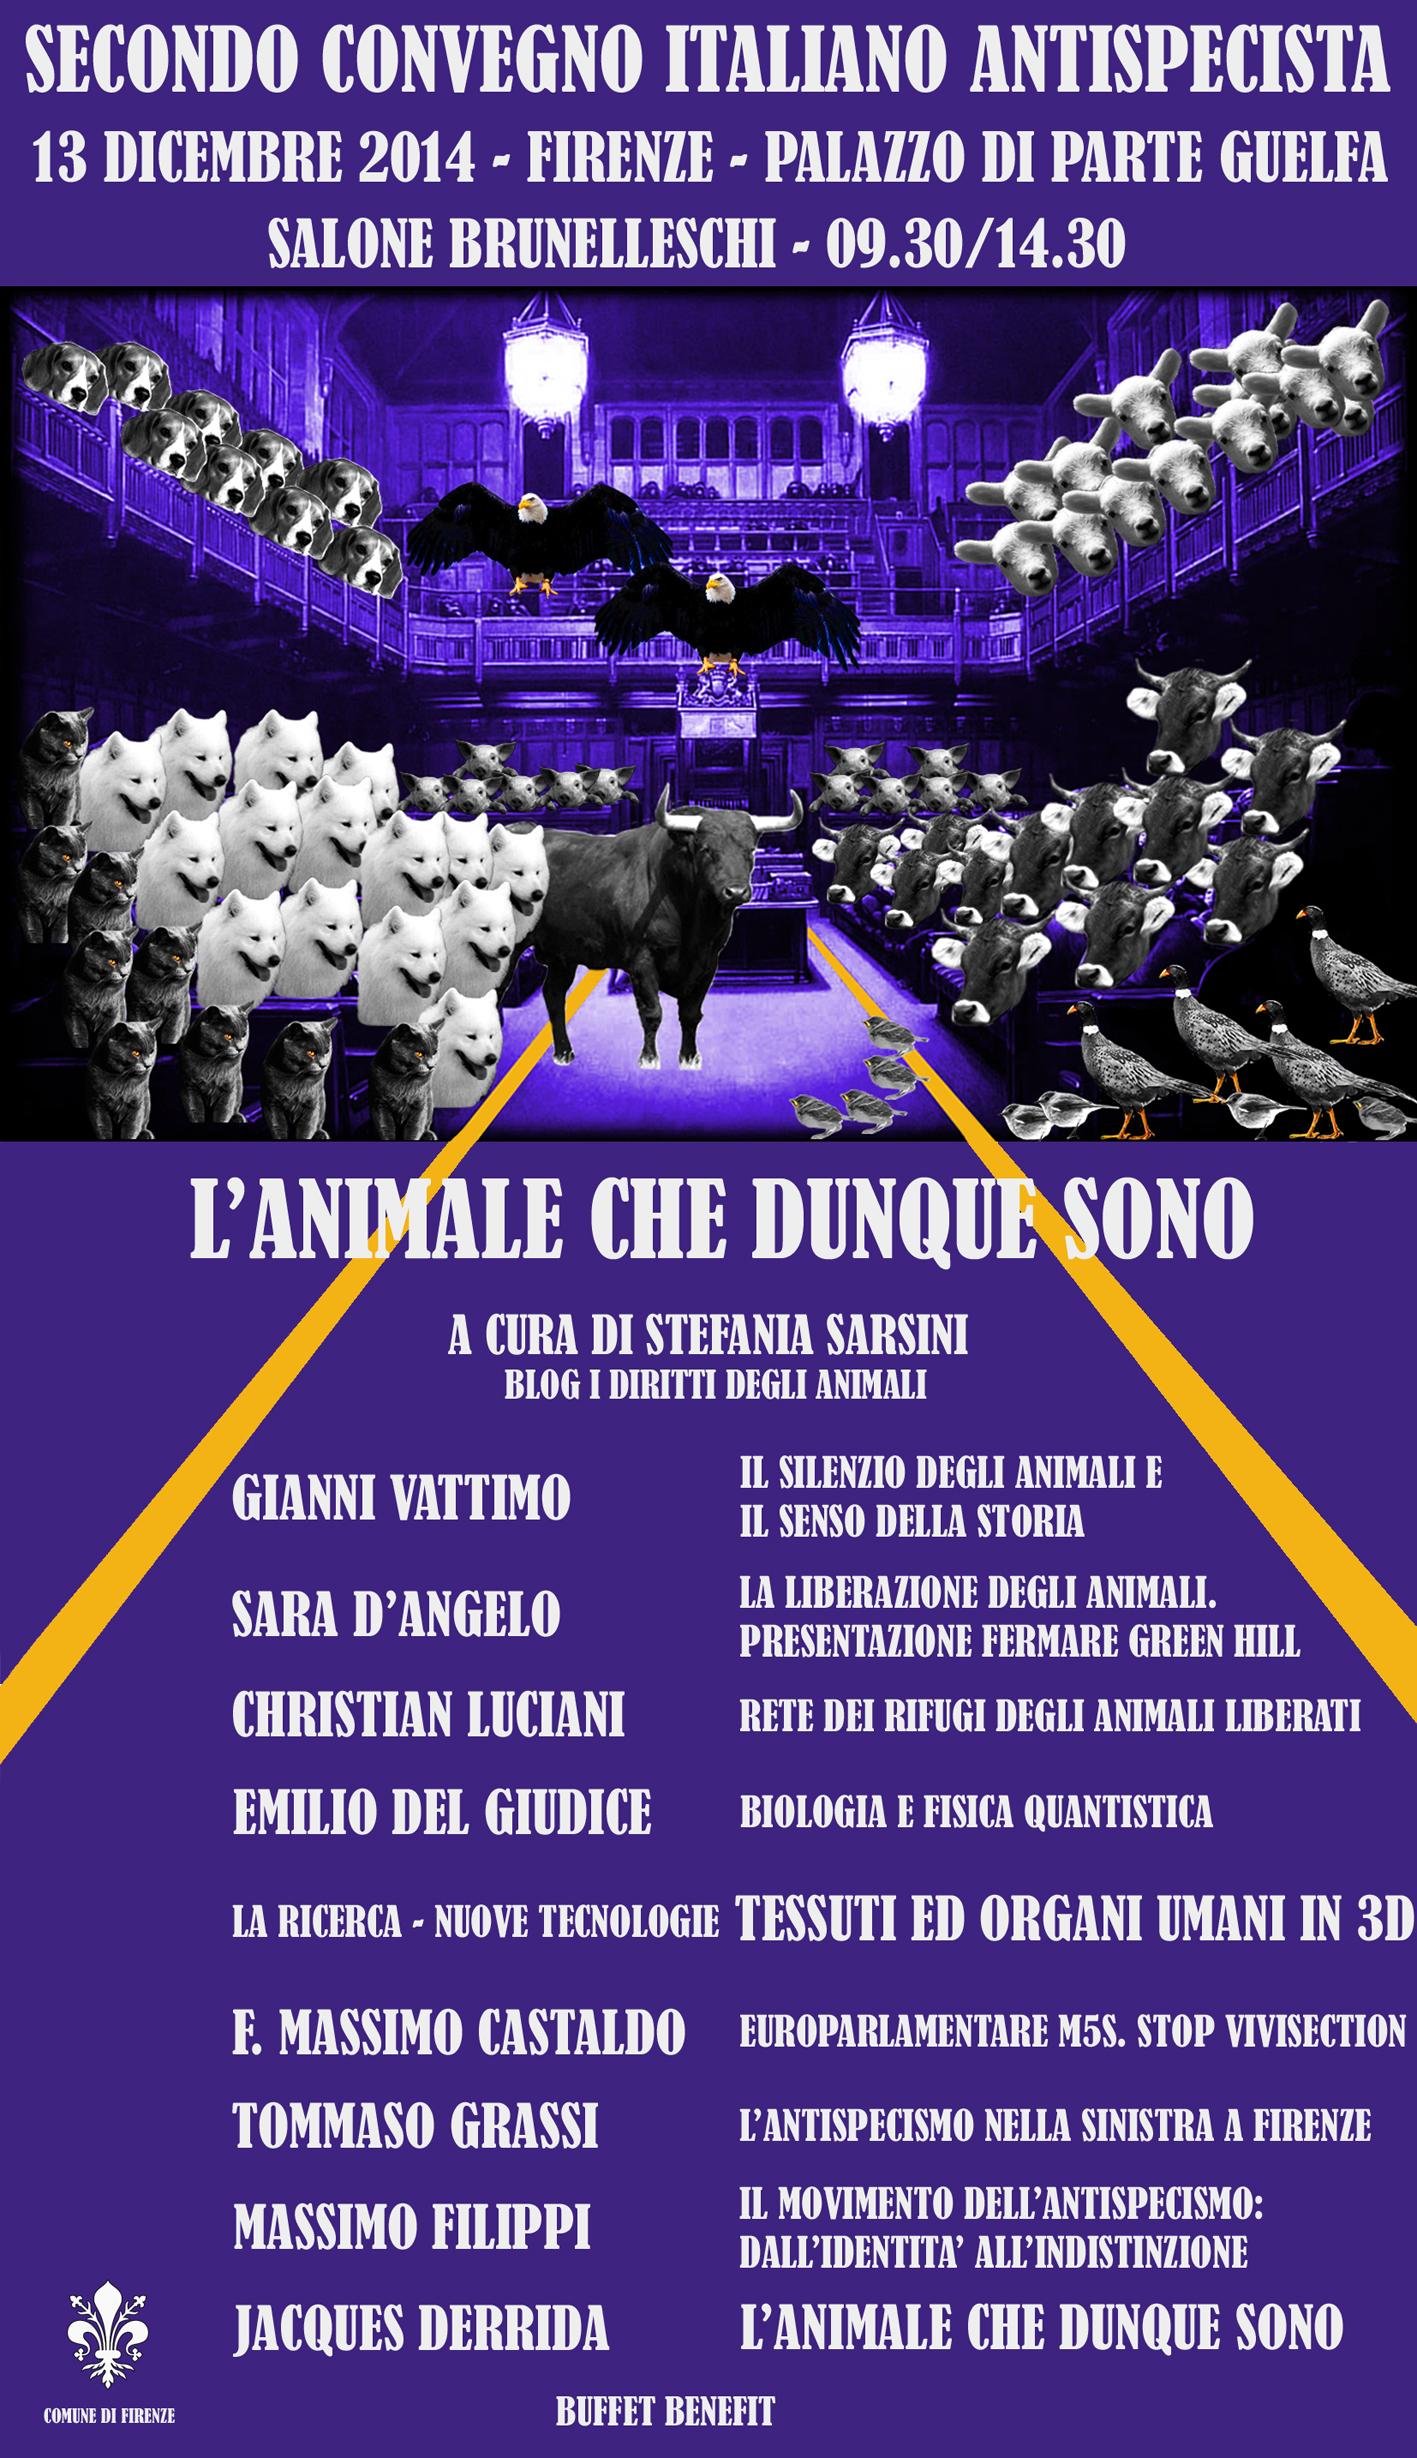 Manifesto SECONDO CONVEGNO ANTISPECISTA 13 DIC. 2014-150dpi (1)